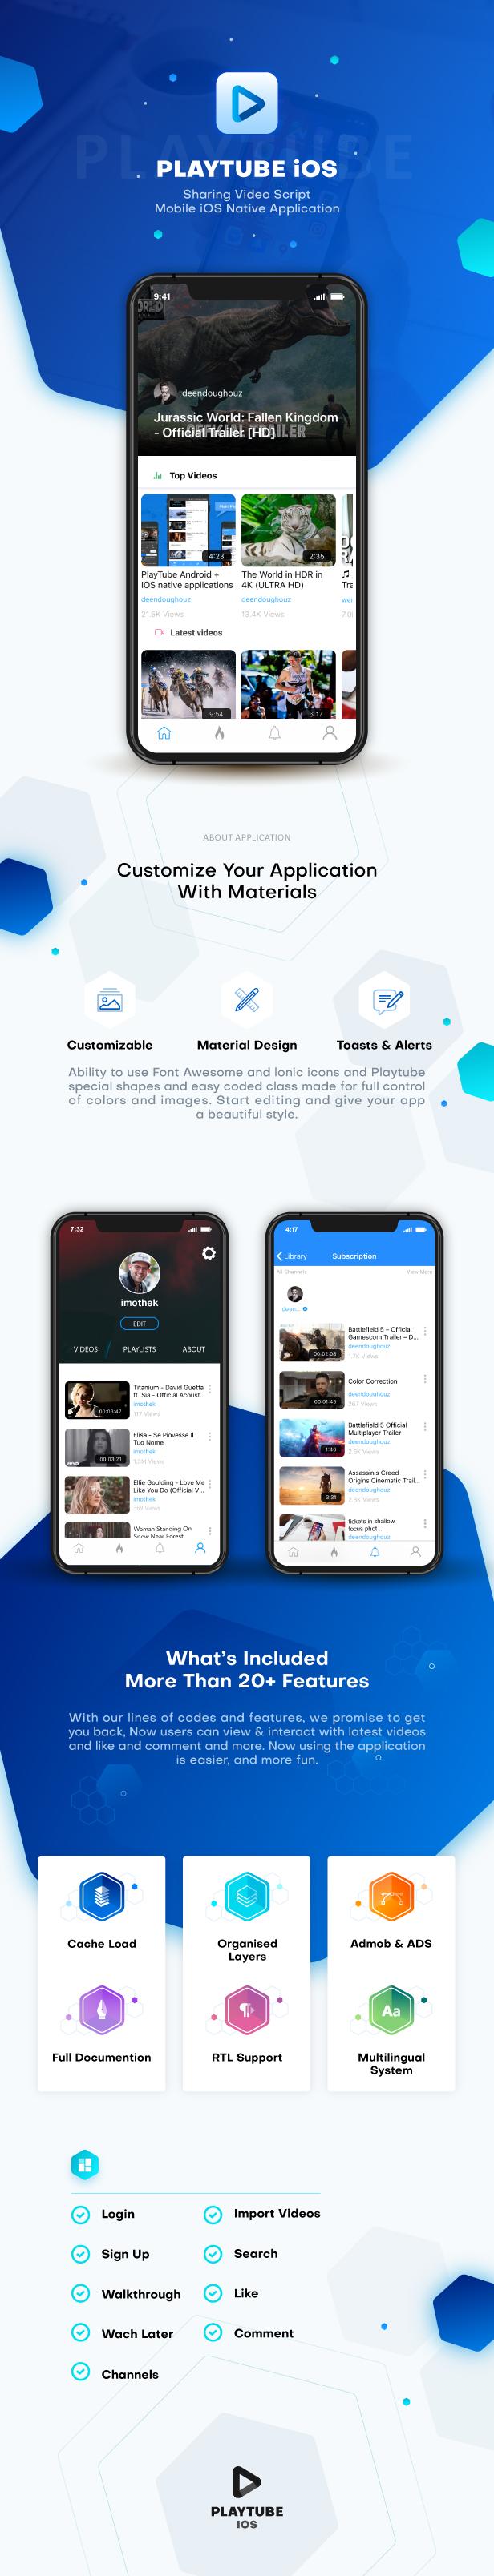 PlayTube IOS - Sharing Video Script Mobile IOS Native Application - 4